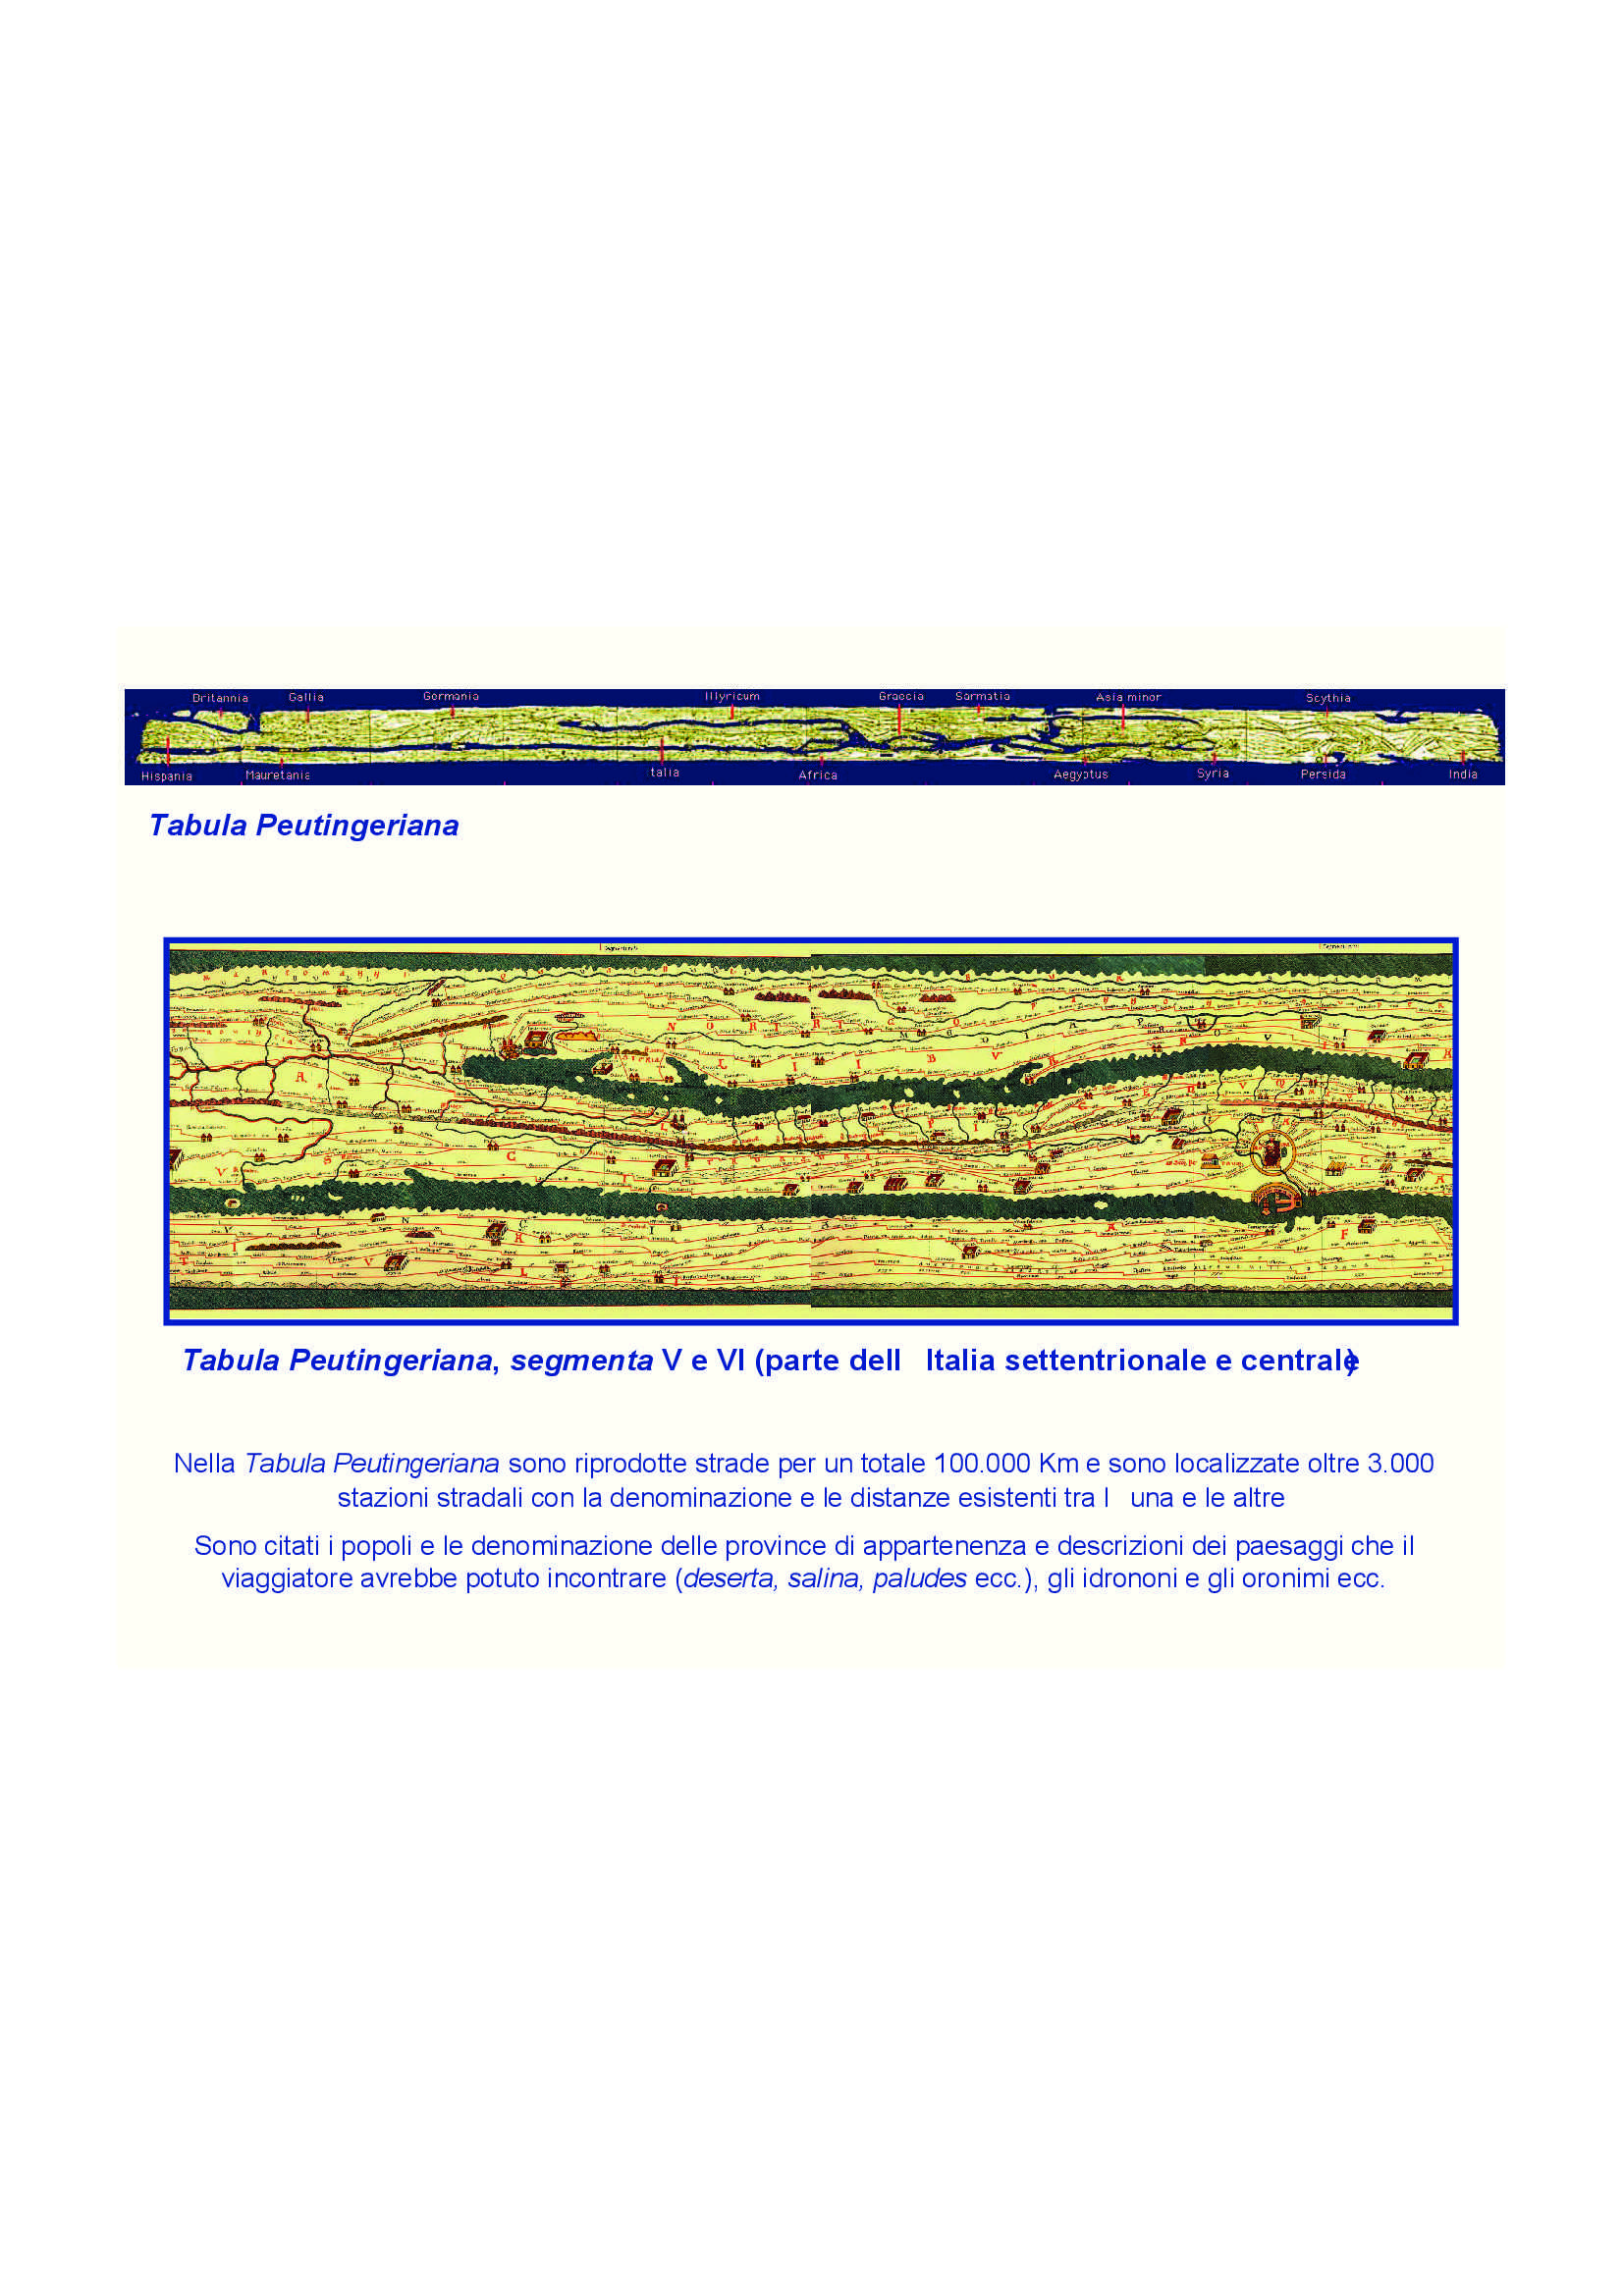 Cartografia nel Medioevo